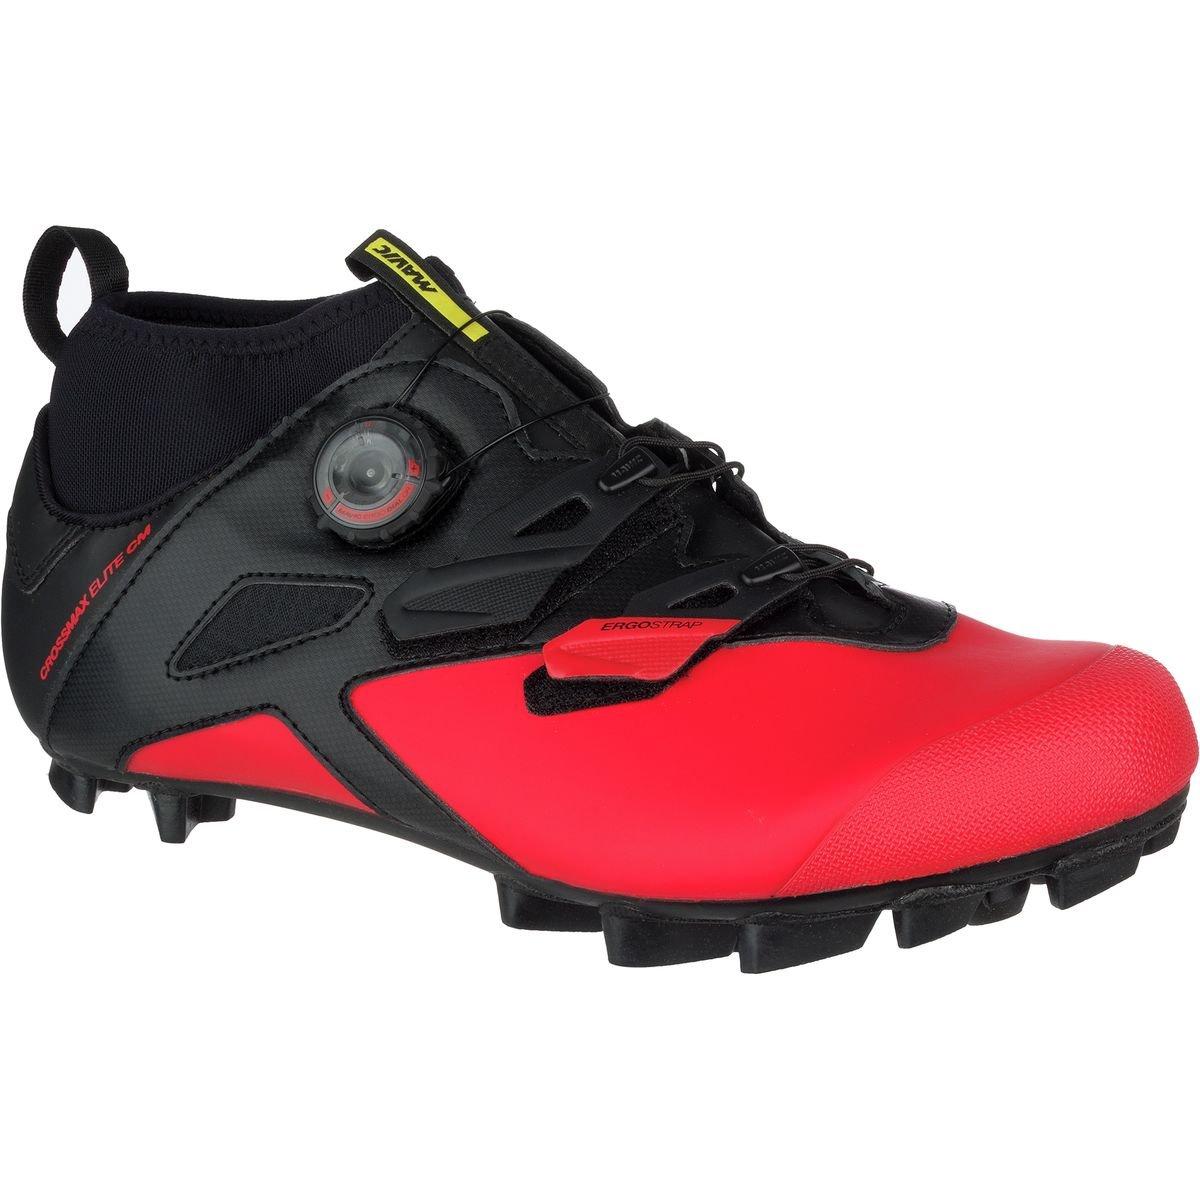 ade6c50147f Amazon.com: Mavic Crossmax Elite cm Cycling Shoe - Men's Black/Fiery  Red/Black, US 12.0/UK 11.5: Sports & Outdoors